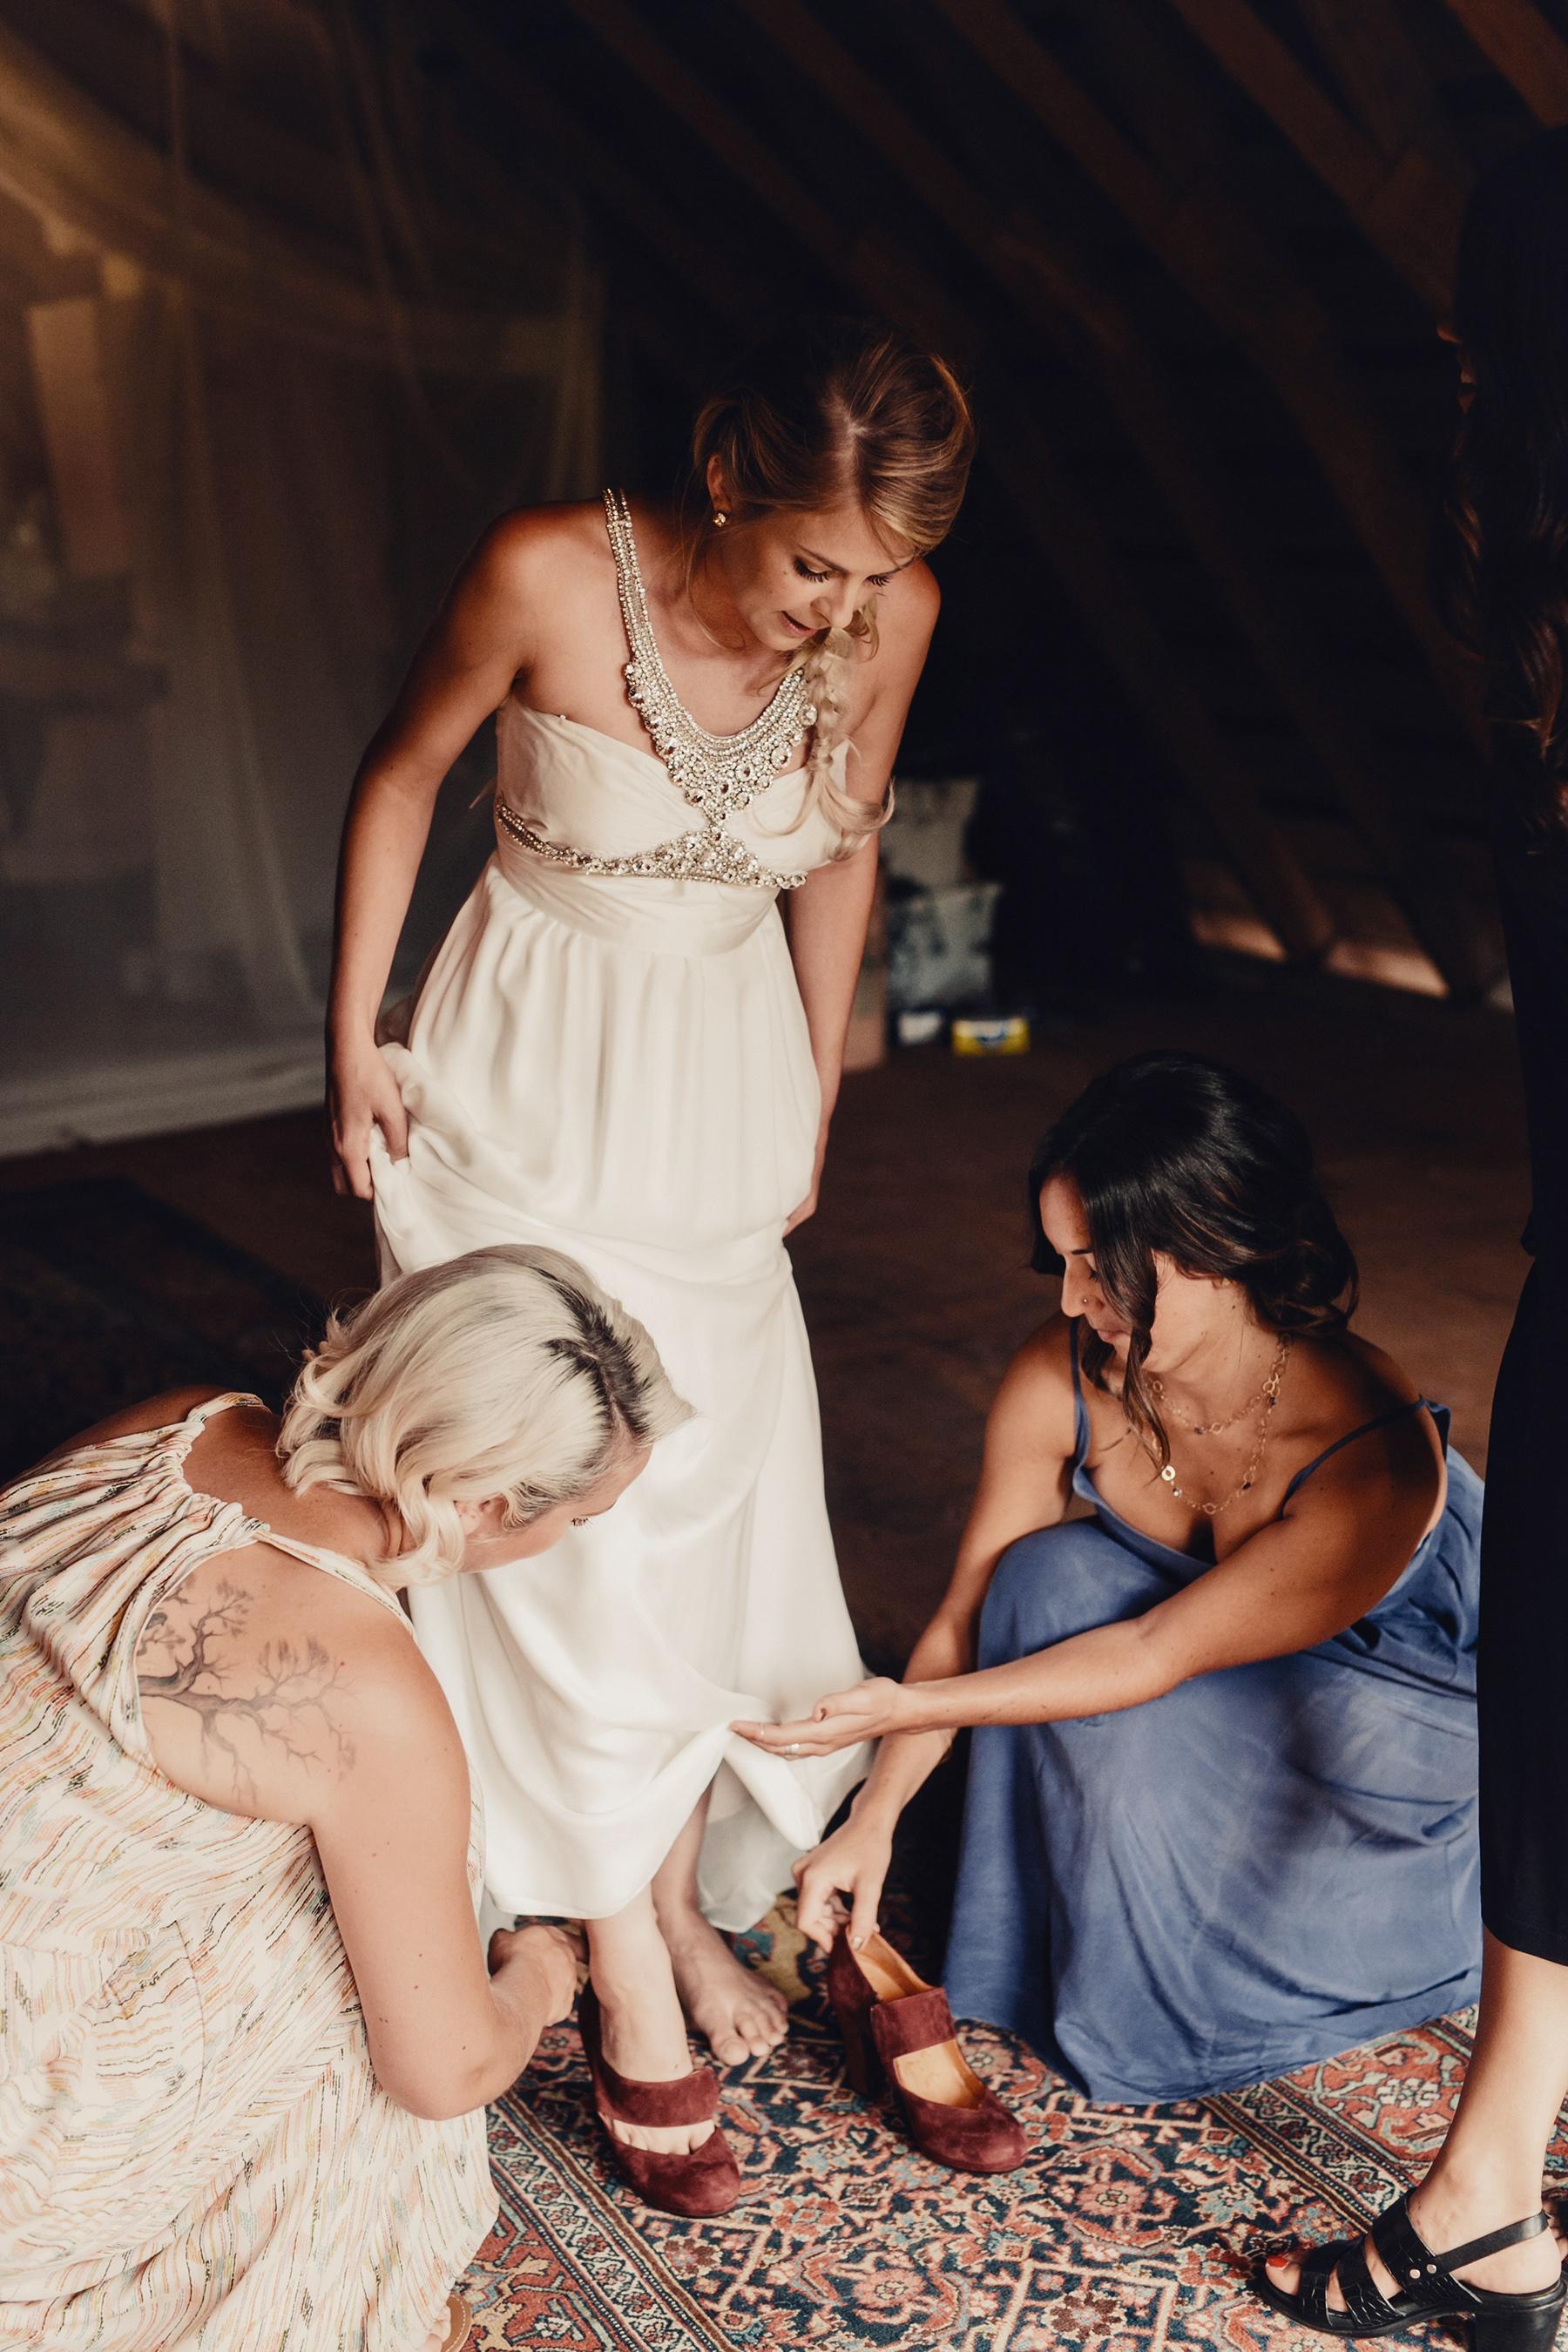 kildara-farms-wedding-photo-inspiration-0017